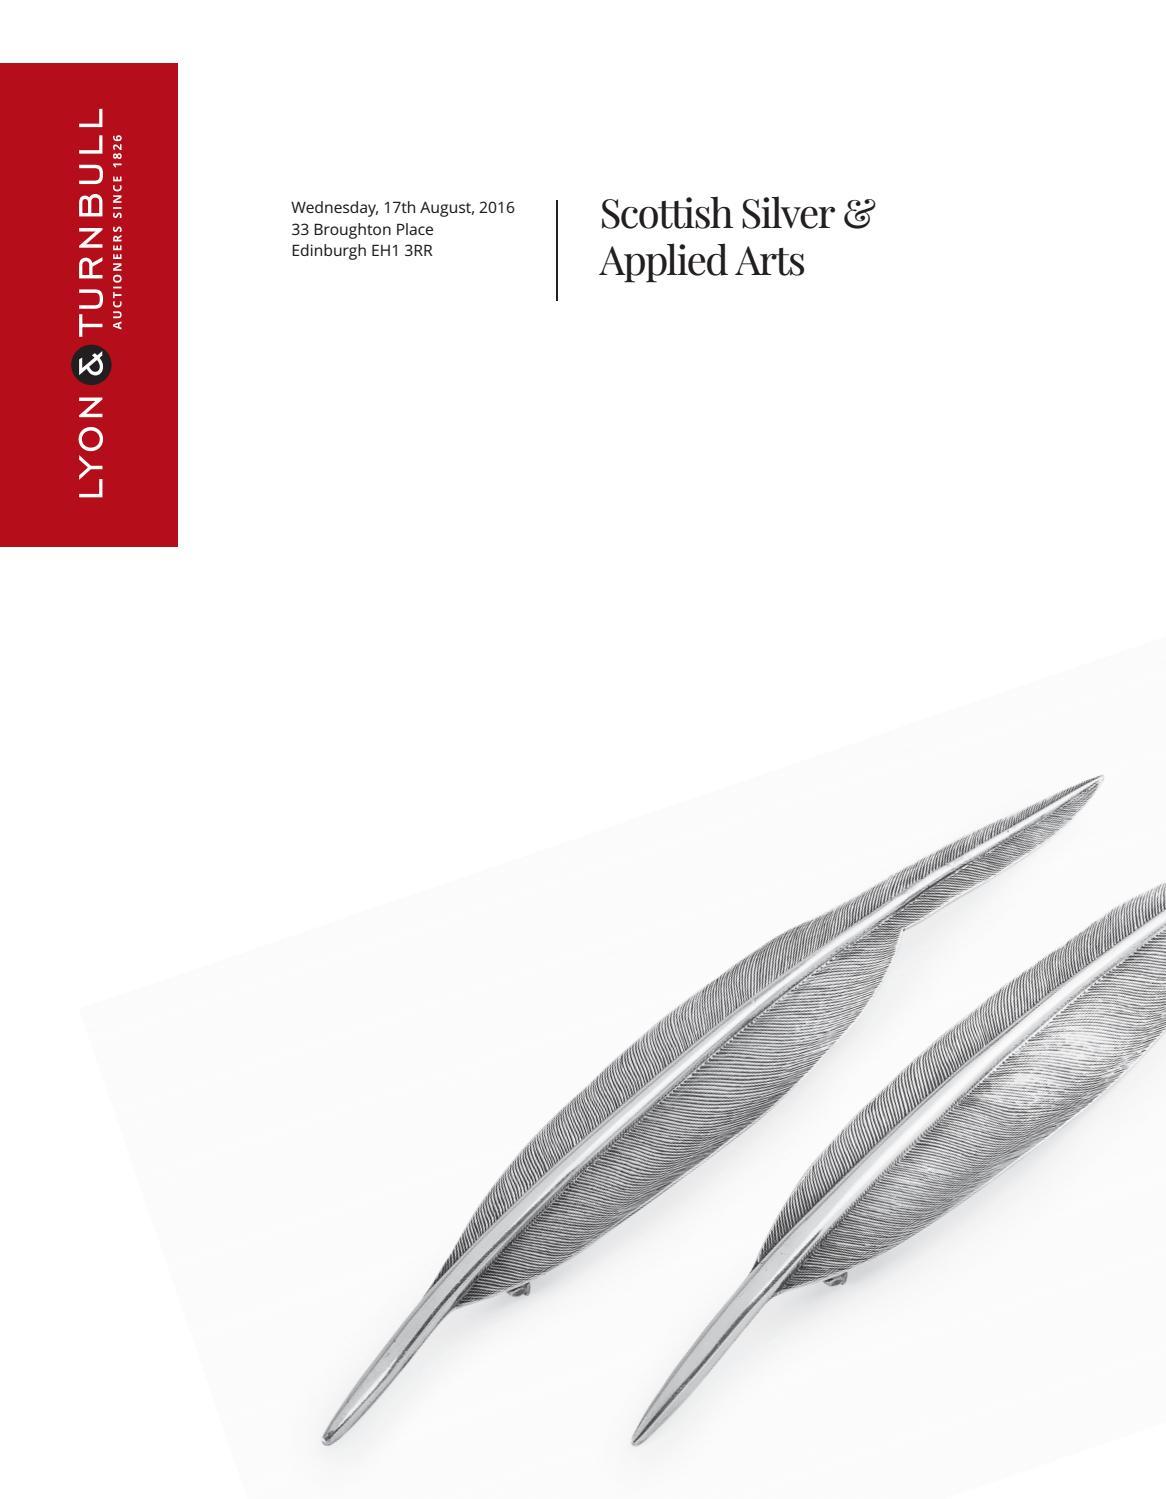 MEDIUM WHITE HAMMER 25 CRESCENT DIE CUT FAVOUR//LUGGAGE TAGS 5.6cm X 2.6cm